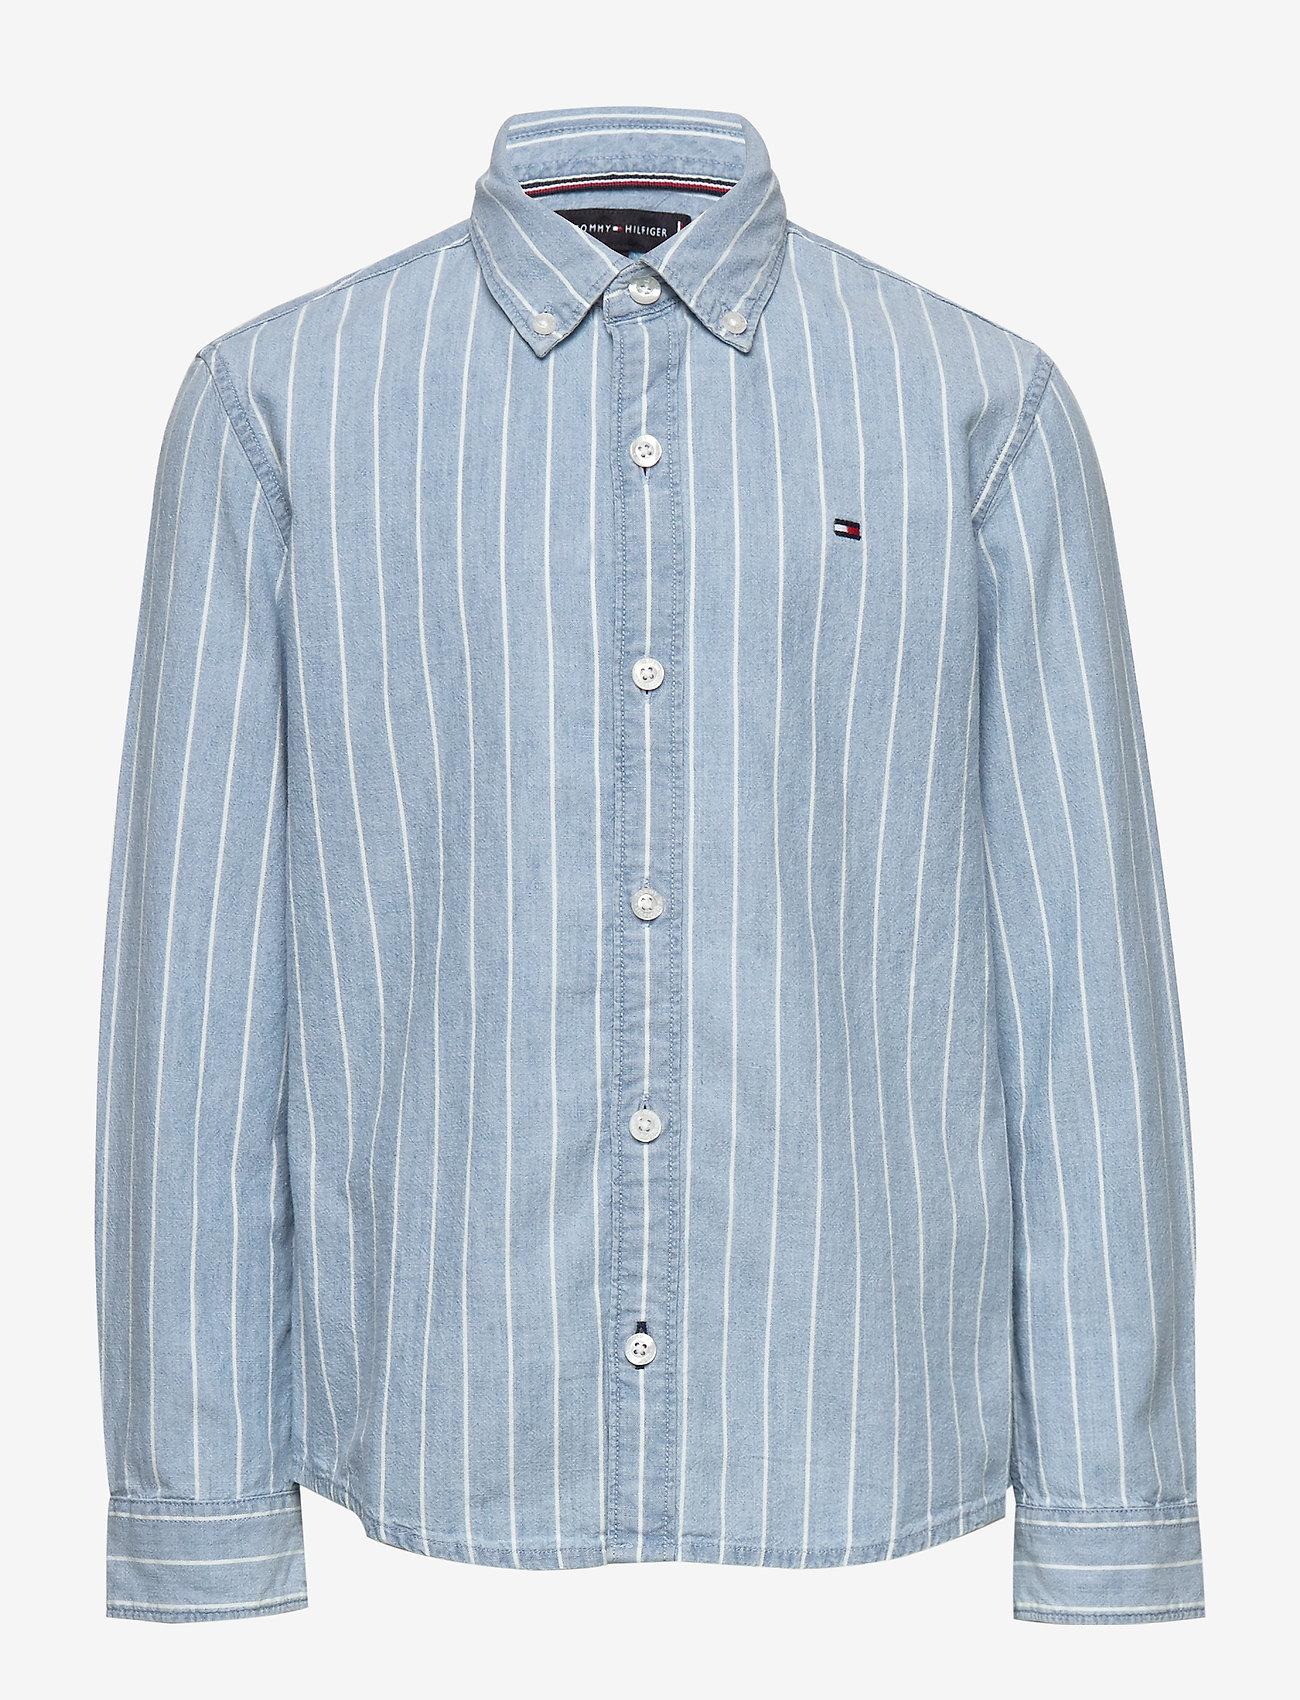 Tommy Hilfiger - DENIM STRIPE SHIRT L - shirts - denim light 01 - 0